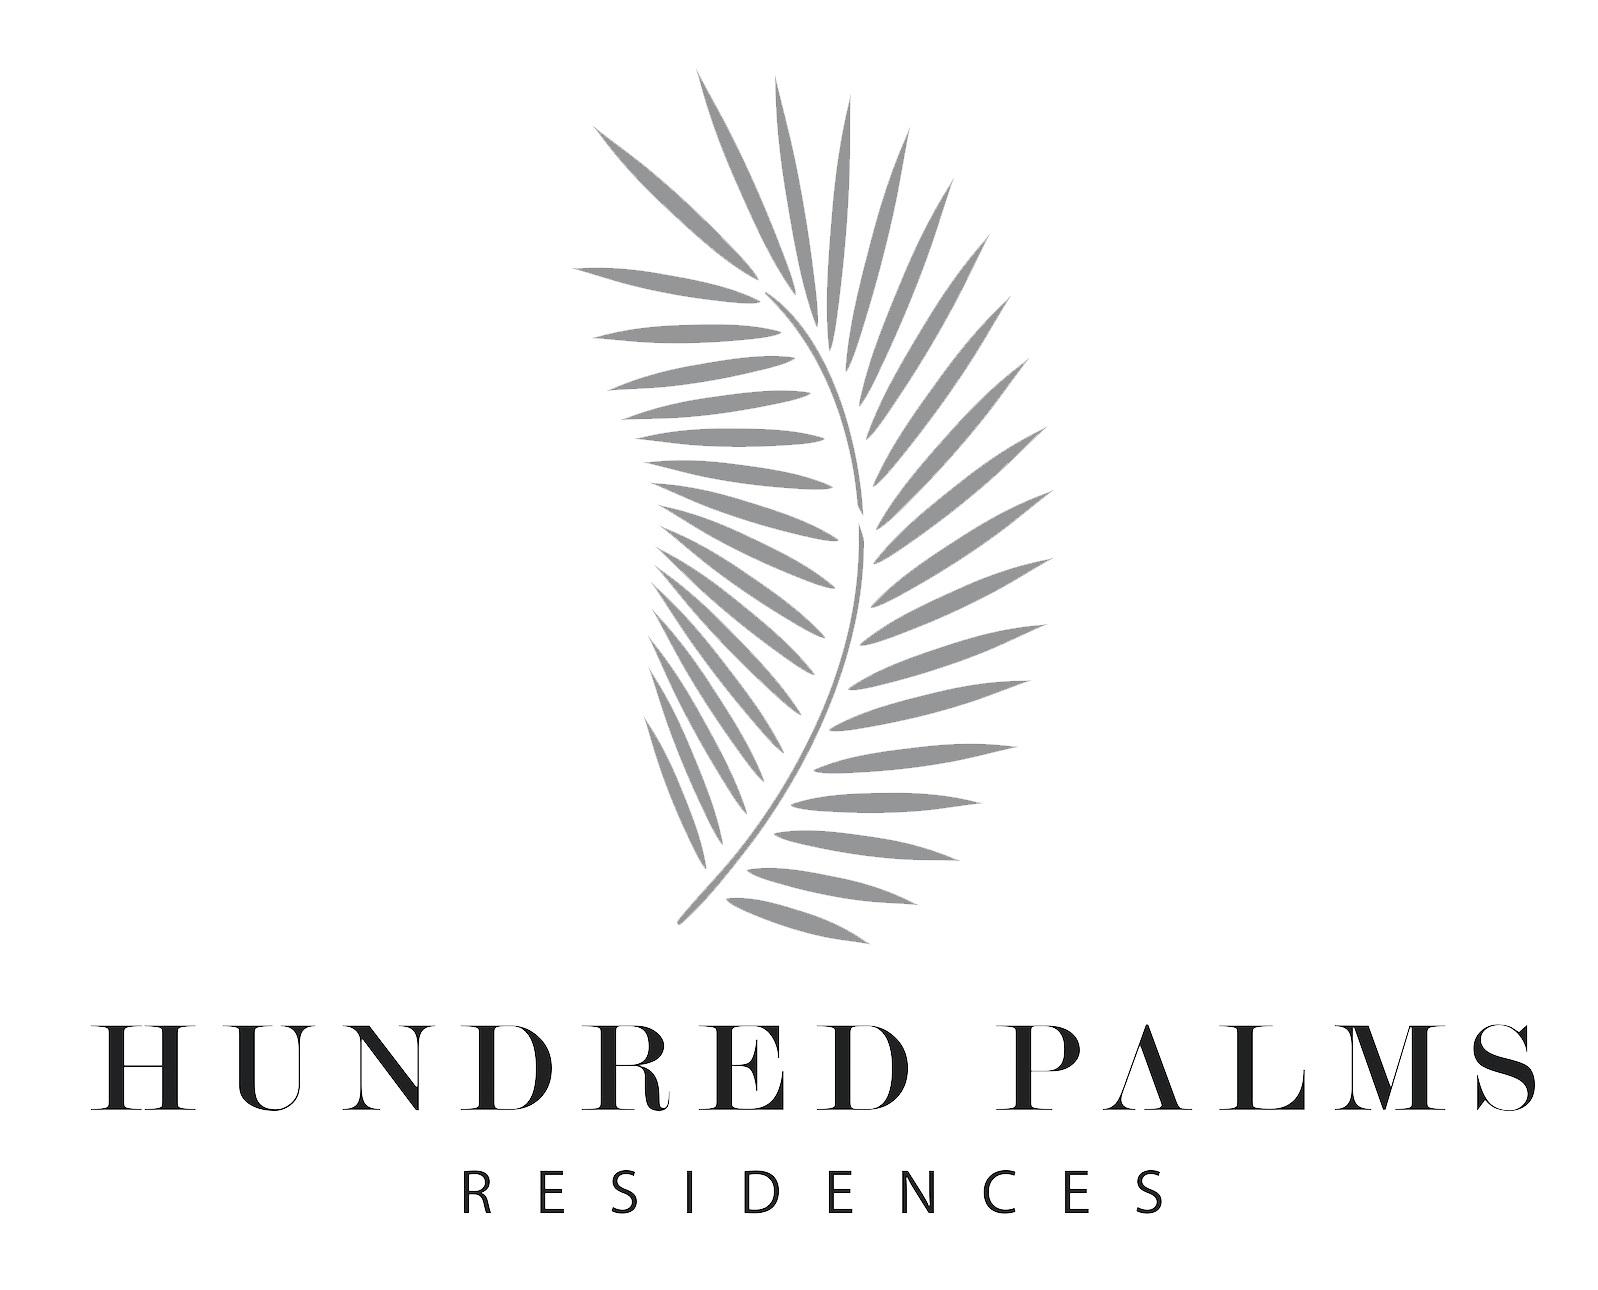 hundred palms residences executive condo logo pic 1